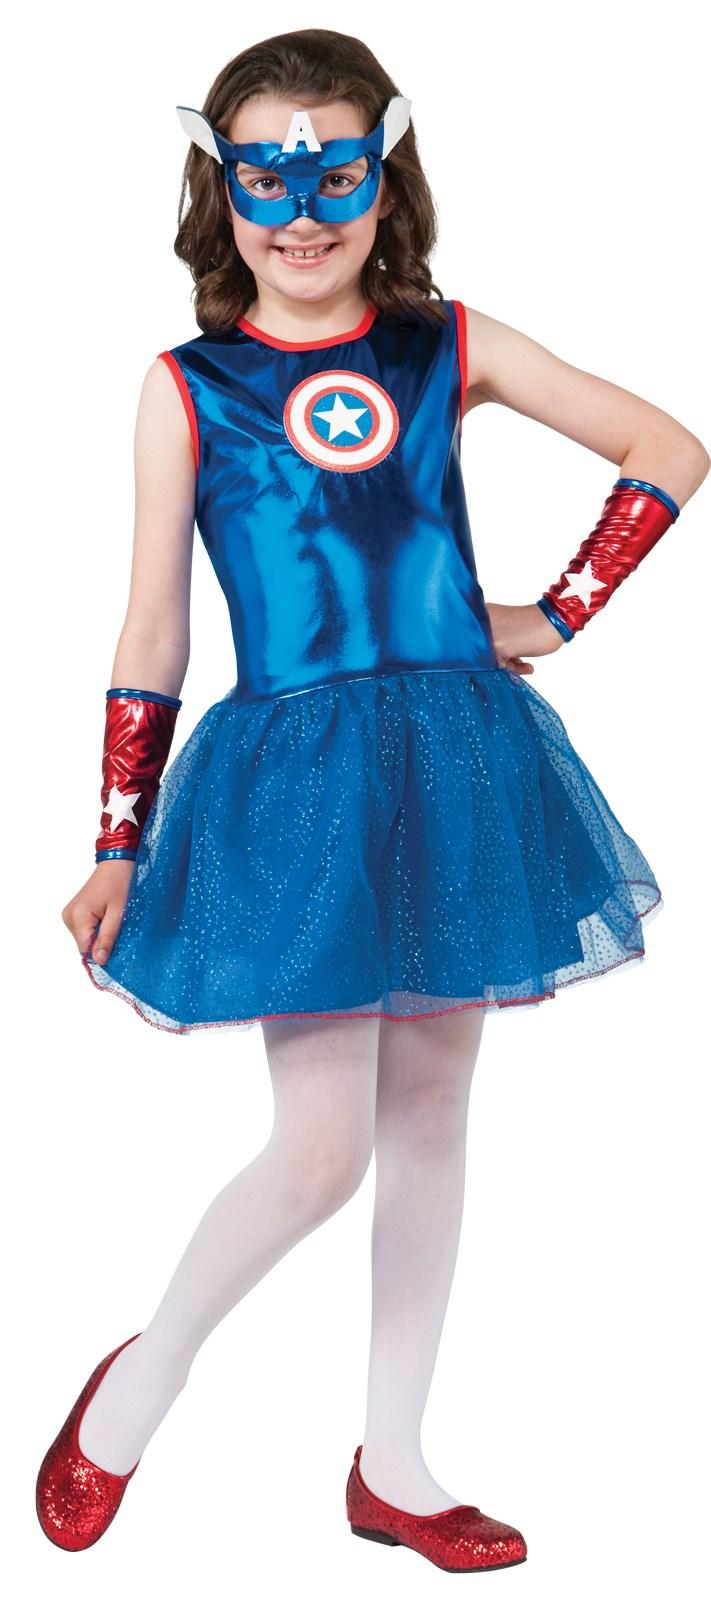 Marvel Captain America Girl Costume | BuyCostumes.com